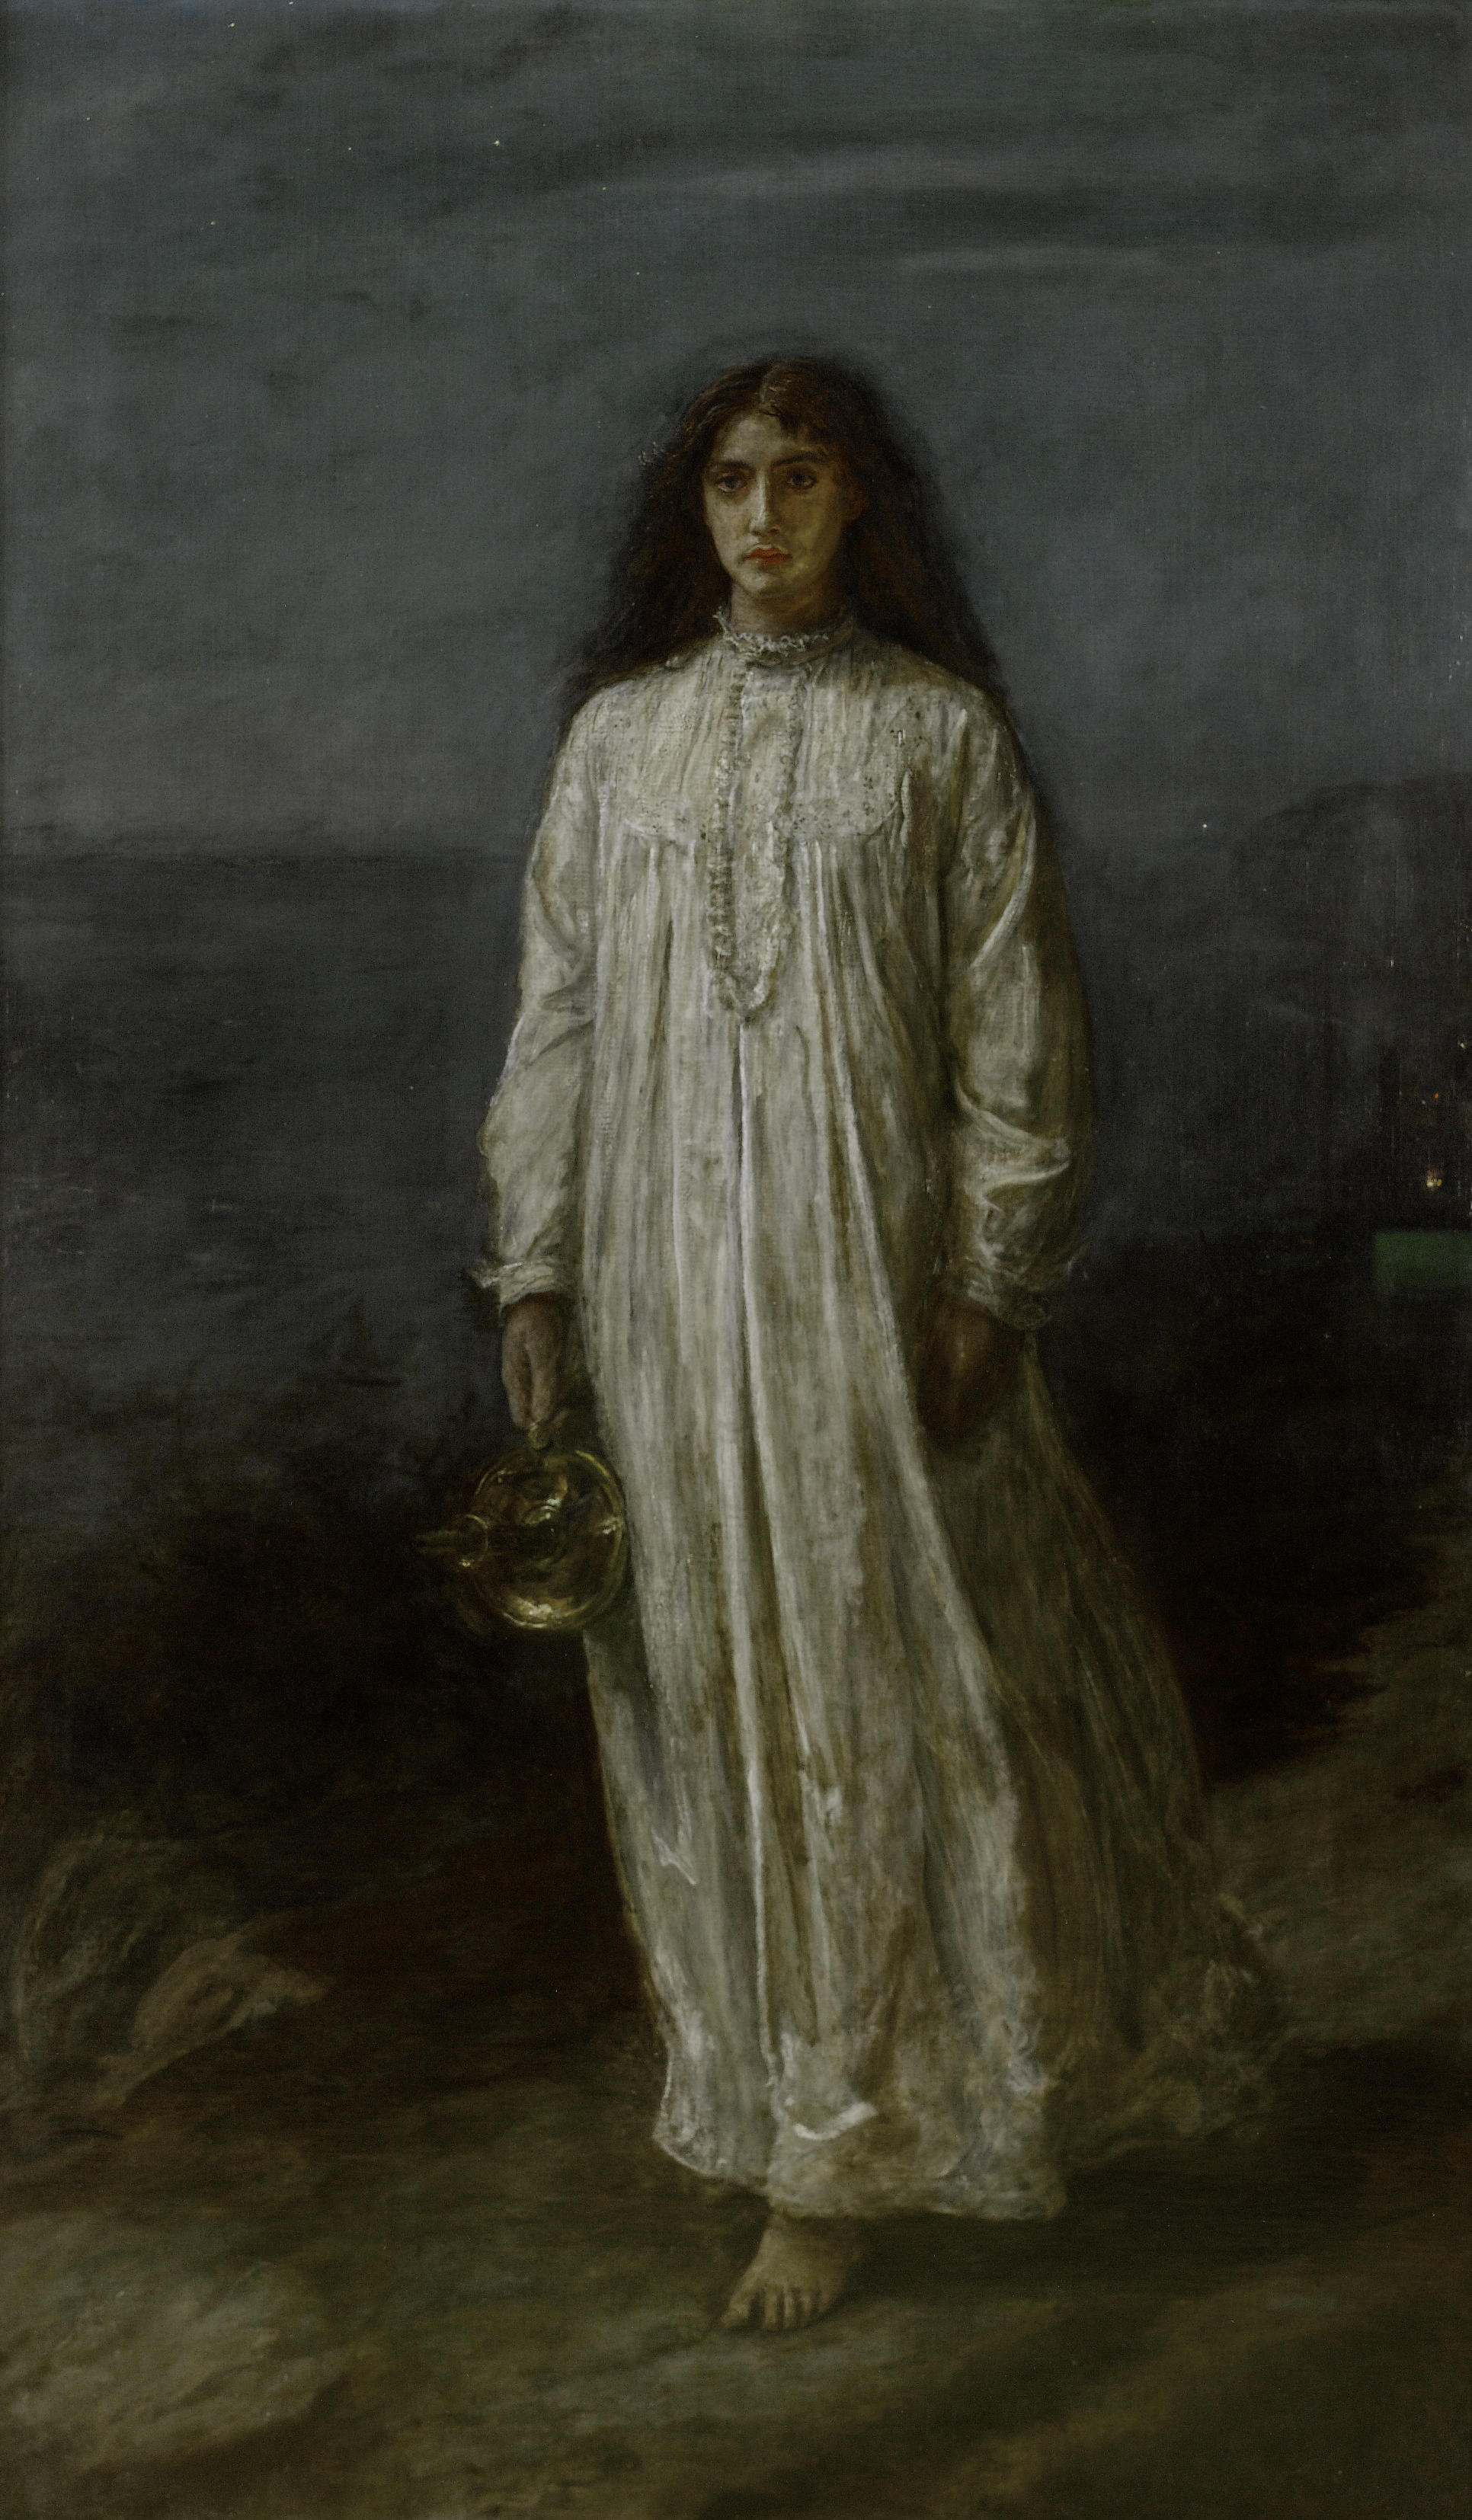 John_Everett_Millais,_The_Somnambulist.jpg